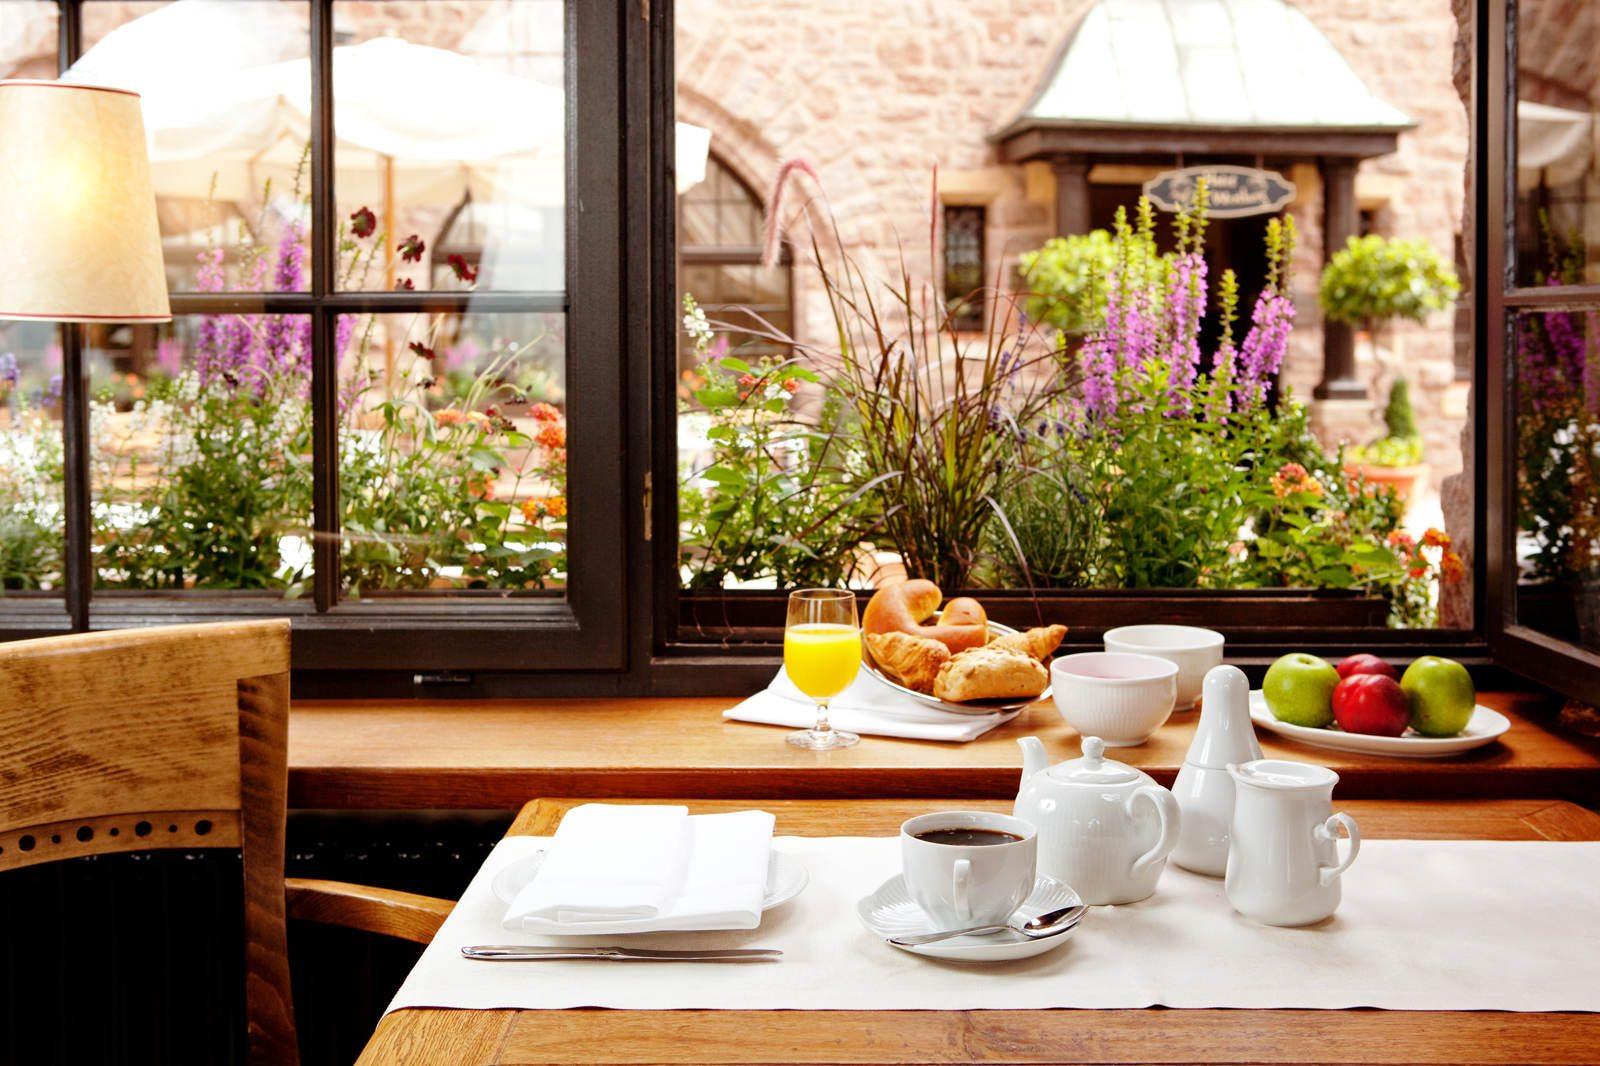 Burgfrühstück